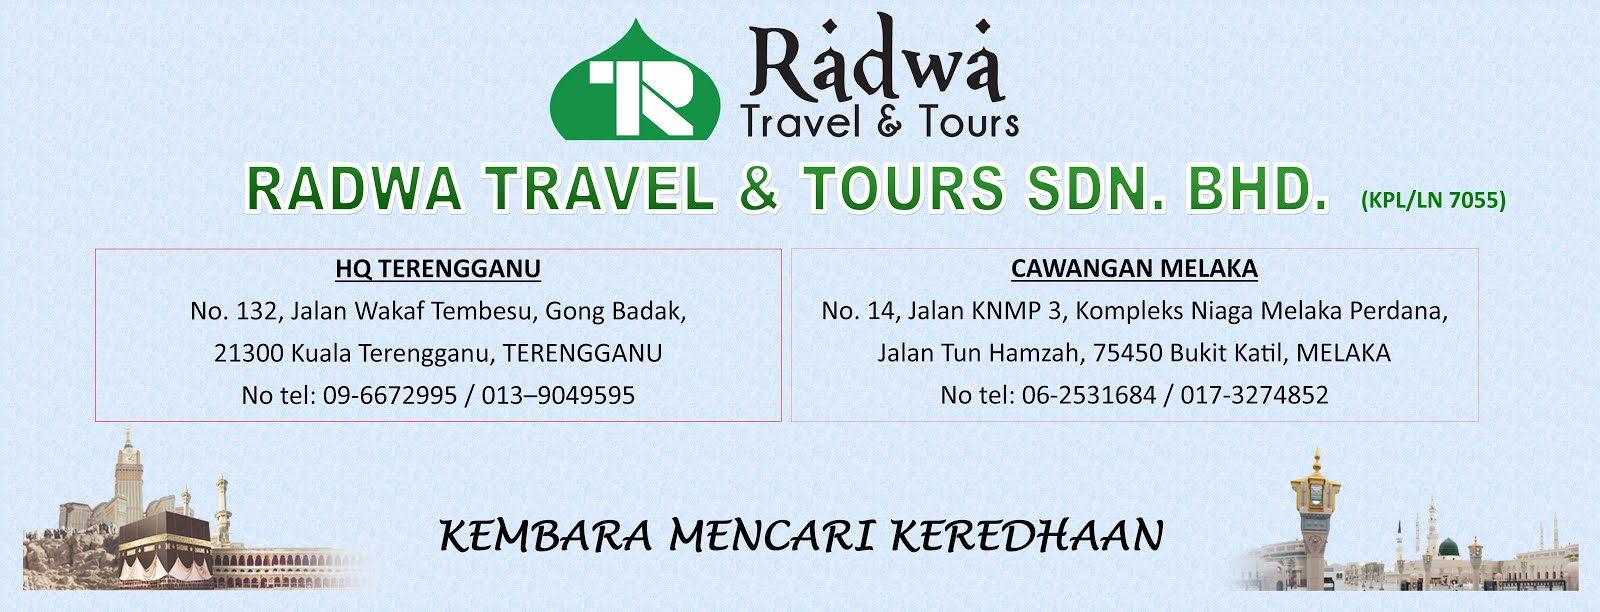 Radwa Travel & Tours Sdn Bhd